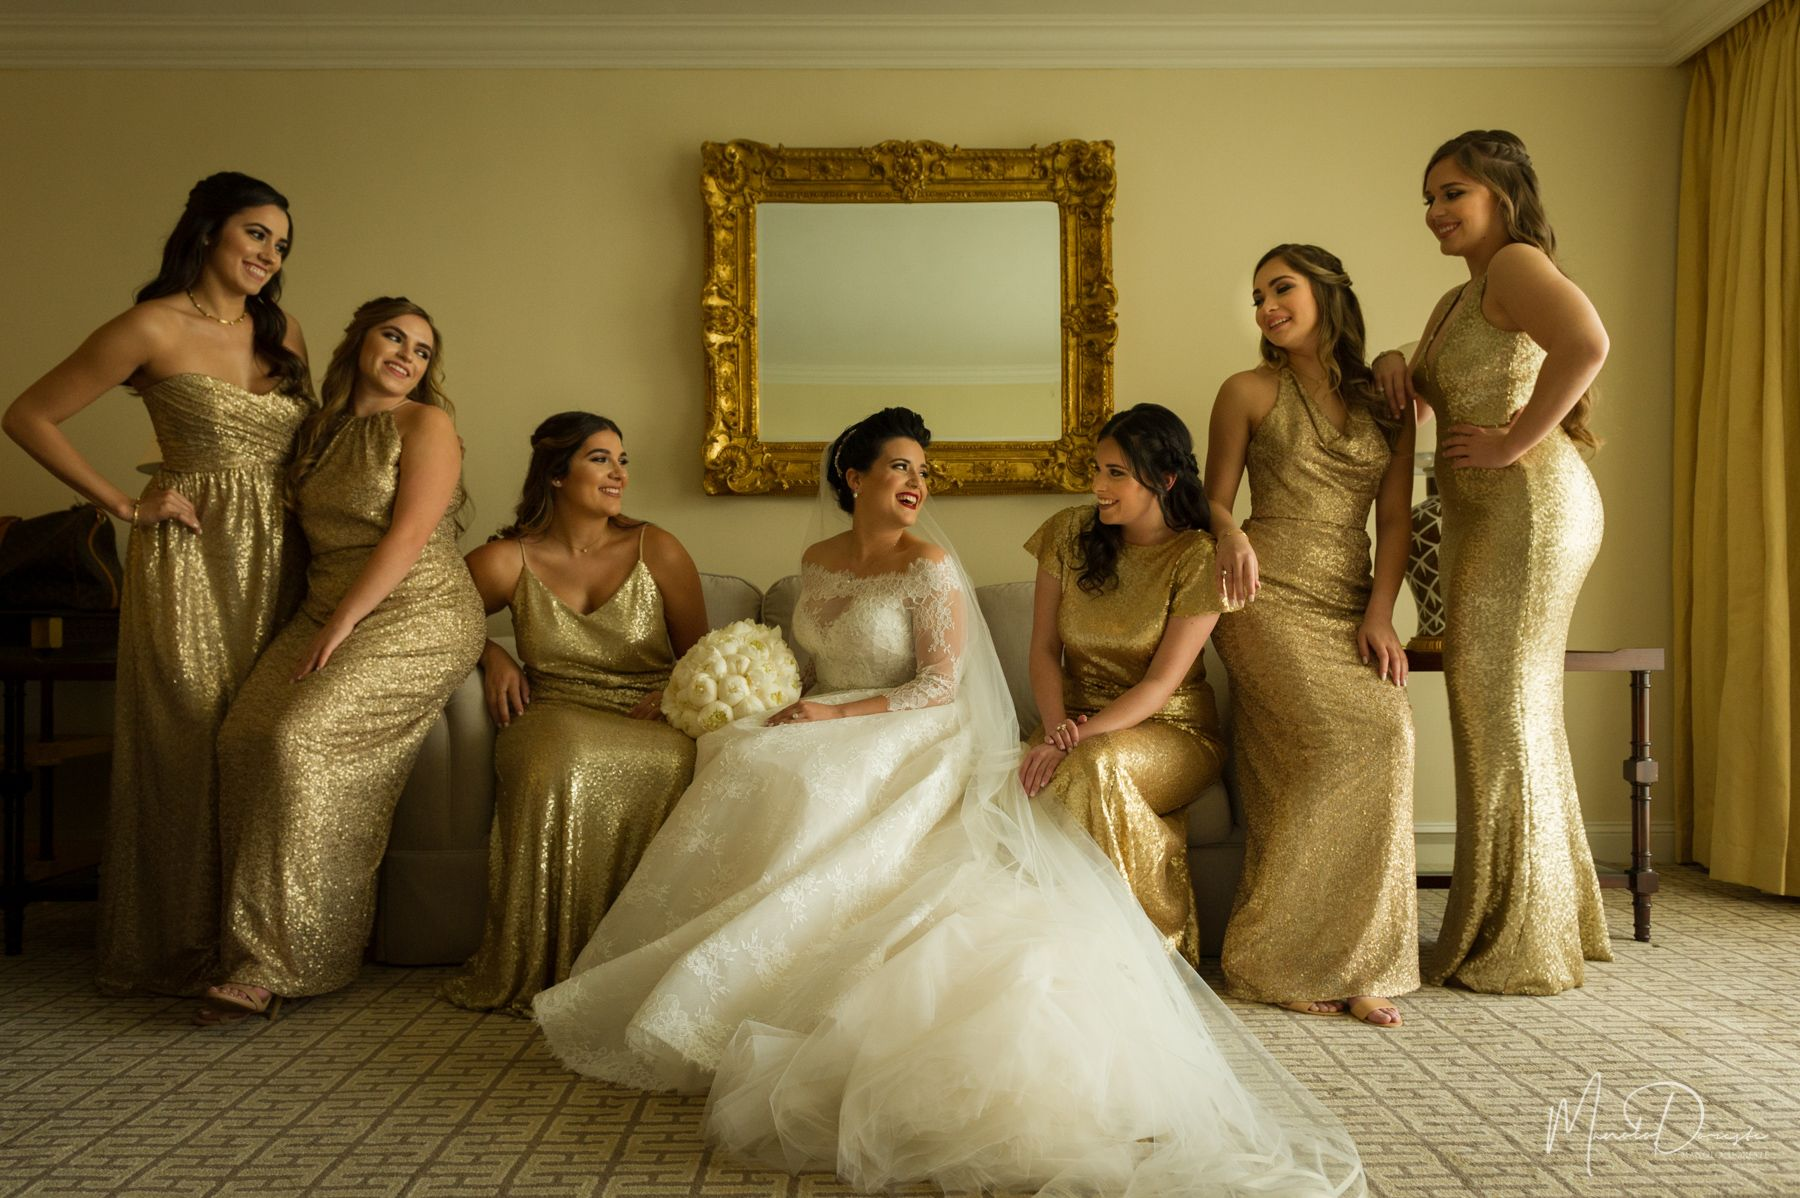 Gold bridesmaids dresses and beautiful bridal gown wedding at gold bridesmaids dresses and beautiful bridal gown wedding at trump national doral miami ombrellifo Images